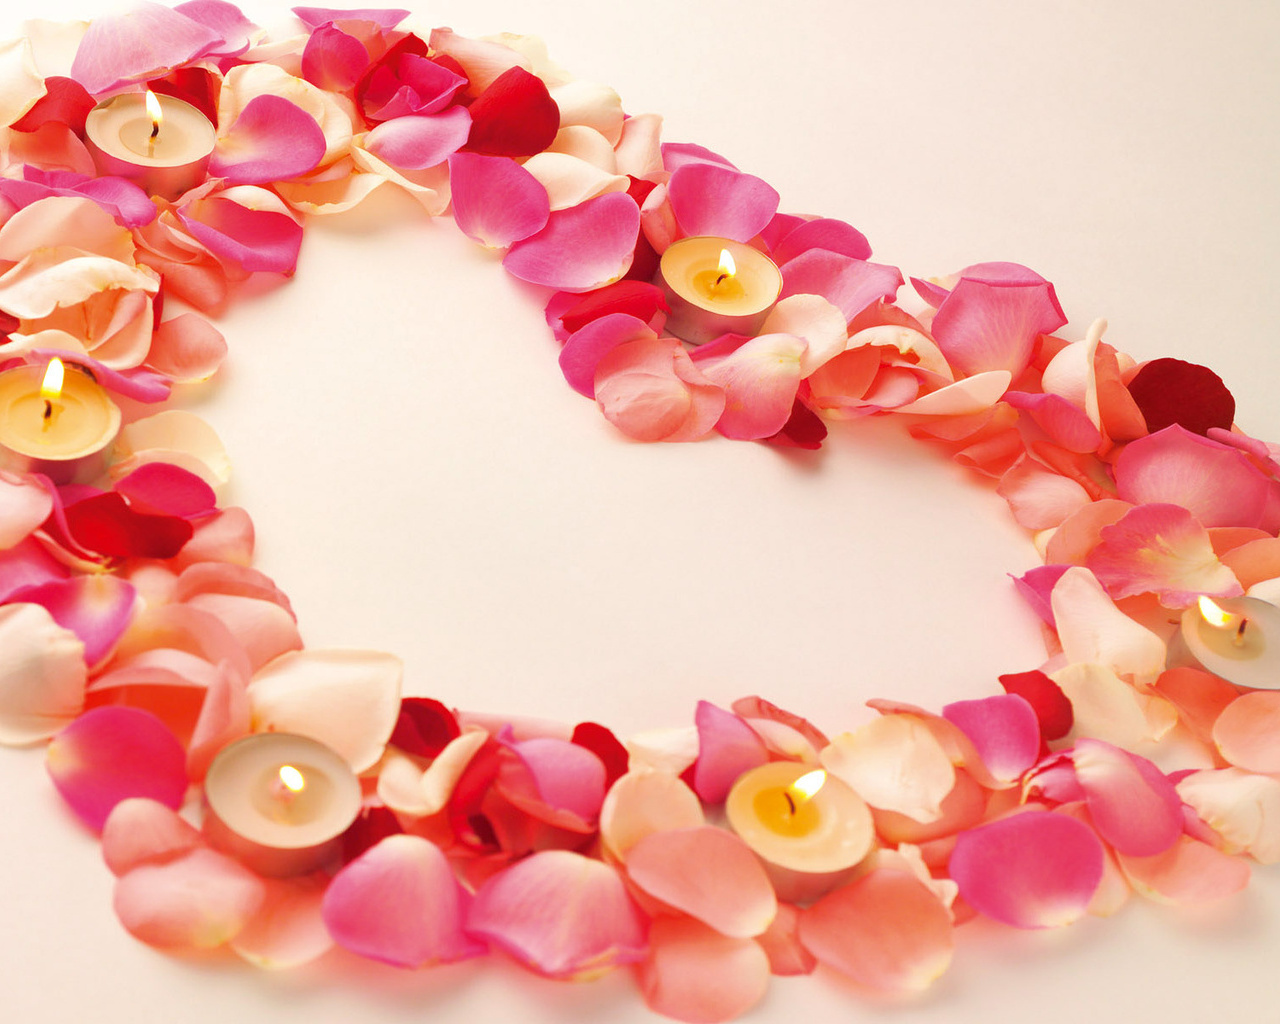 http://2.bp.blogspot.com/-7B-JT7_uxhc/TVf0GLNCR0I/AAAAAAAAAbY/ovAfSUDOlQI/s1600/valentine-day-wallpaper.jpg